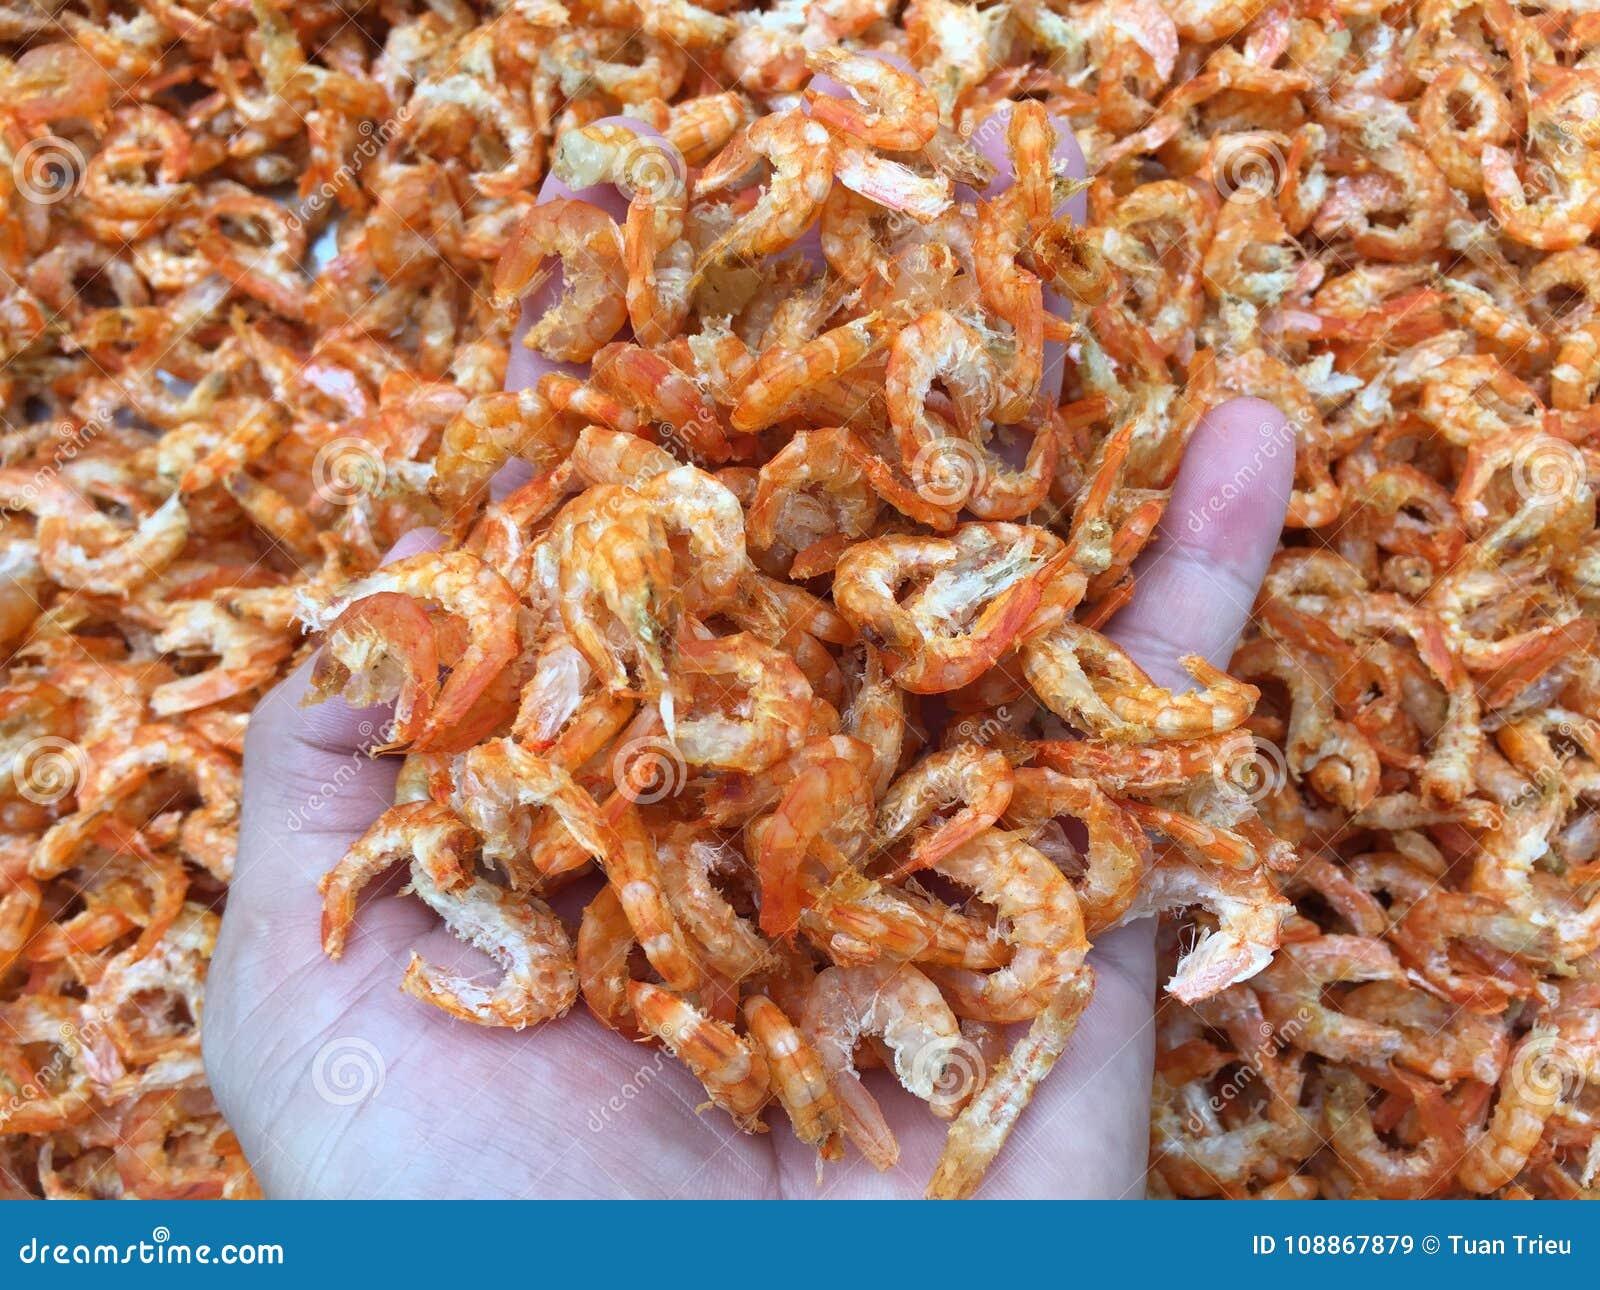 Traditional Vietnamese cuisine: dried shrimp